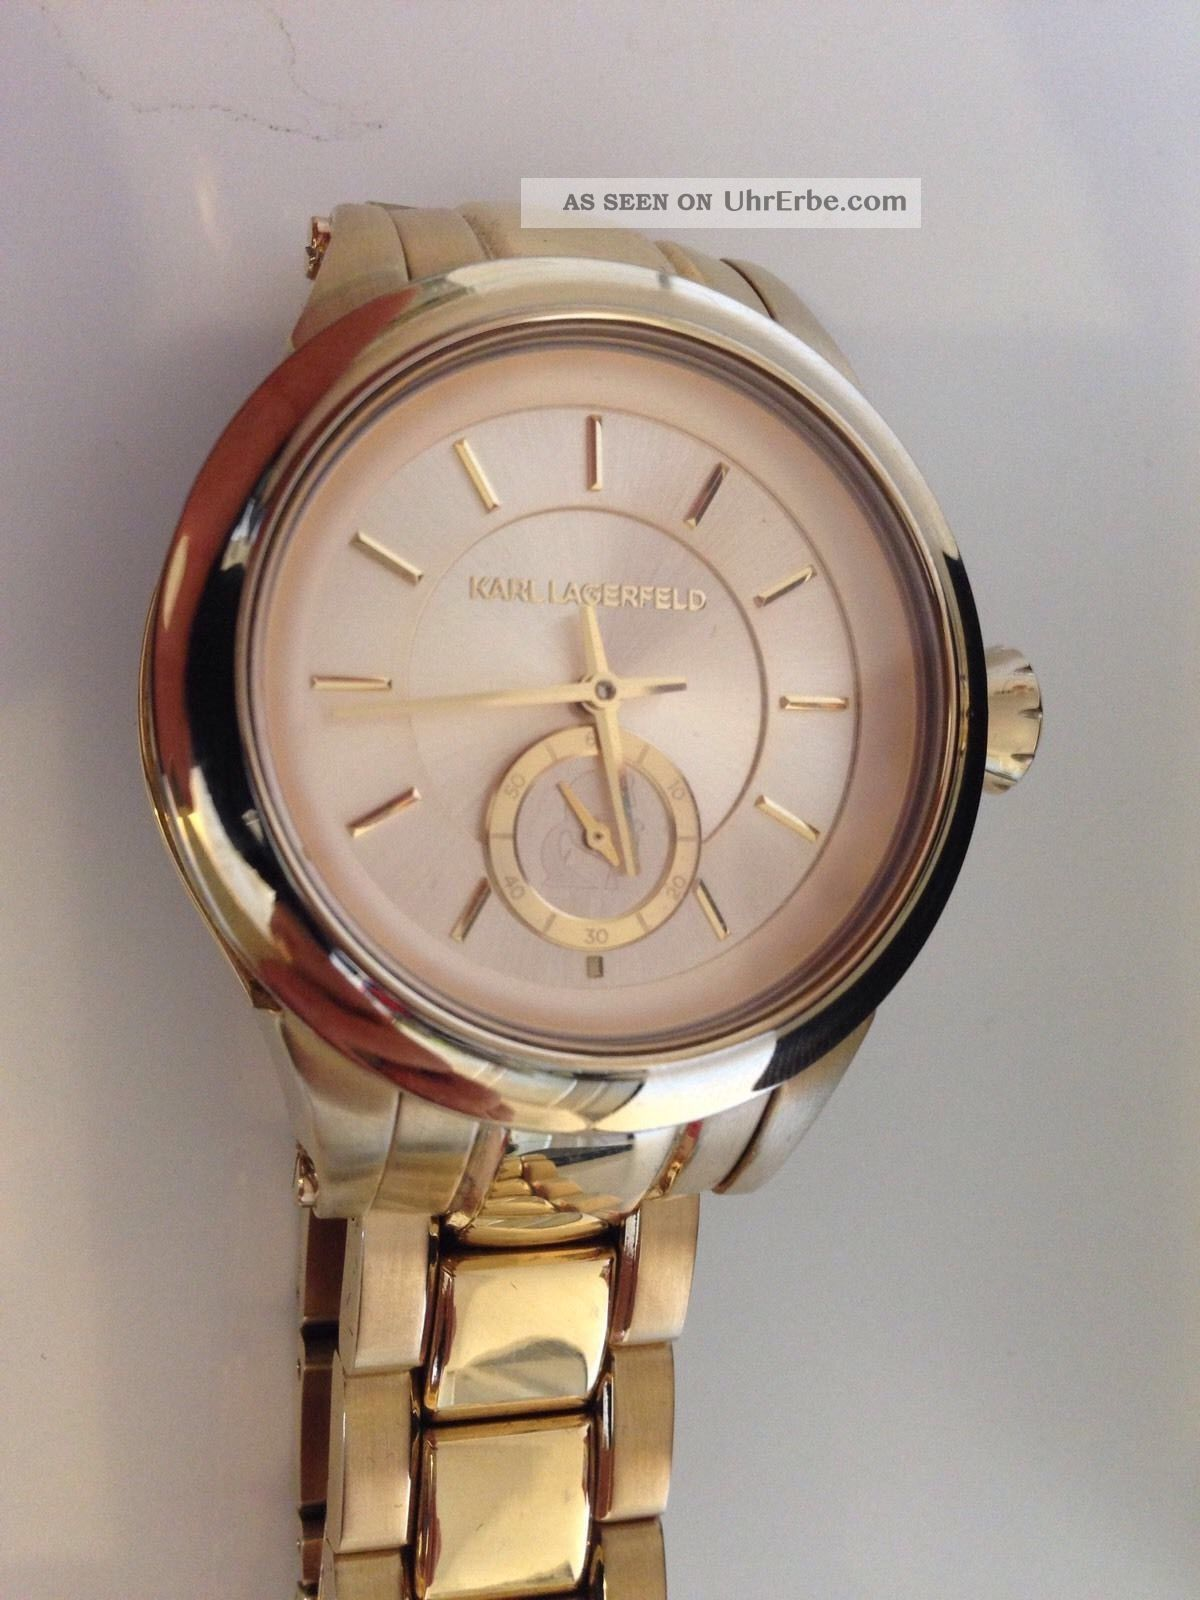 karl lagerfeld kl1217 armband uhr unisex watch stainless. Black Bedroom Furniture Sets. Home Design Ideas